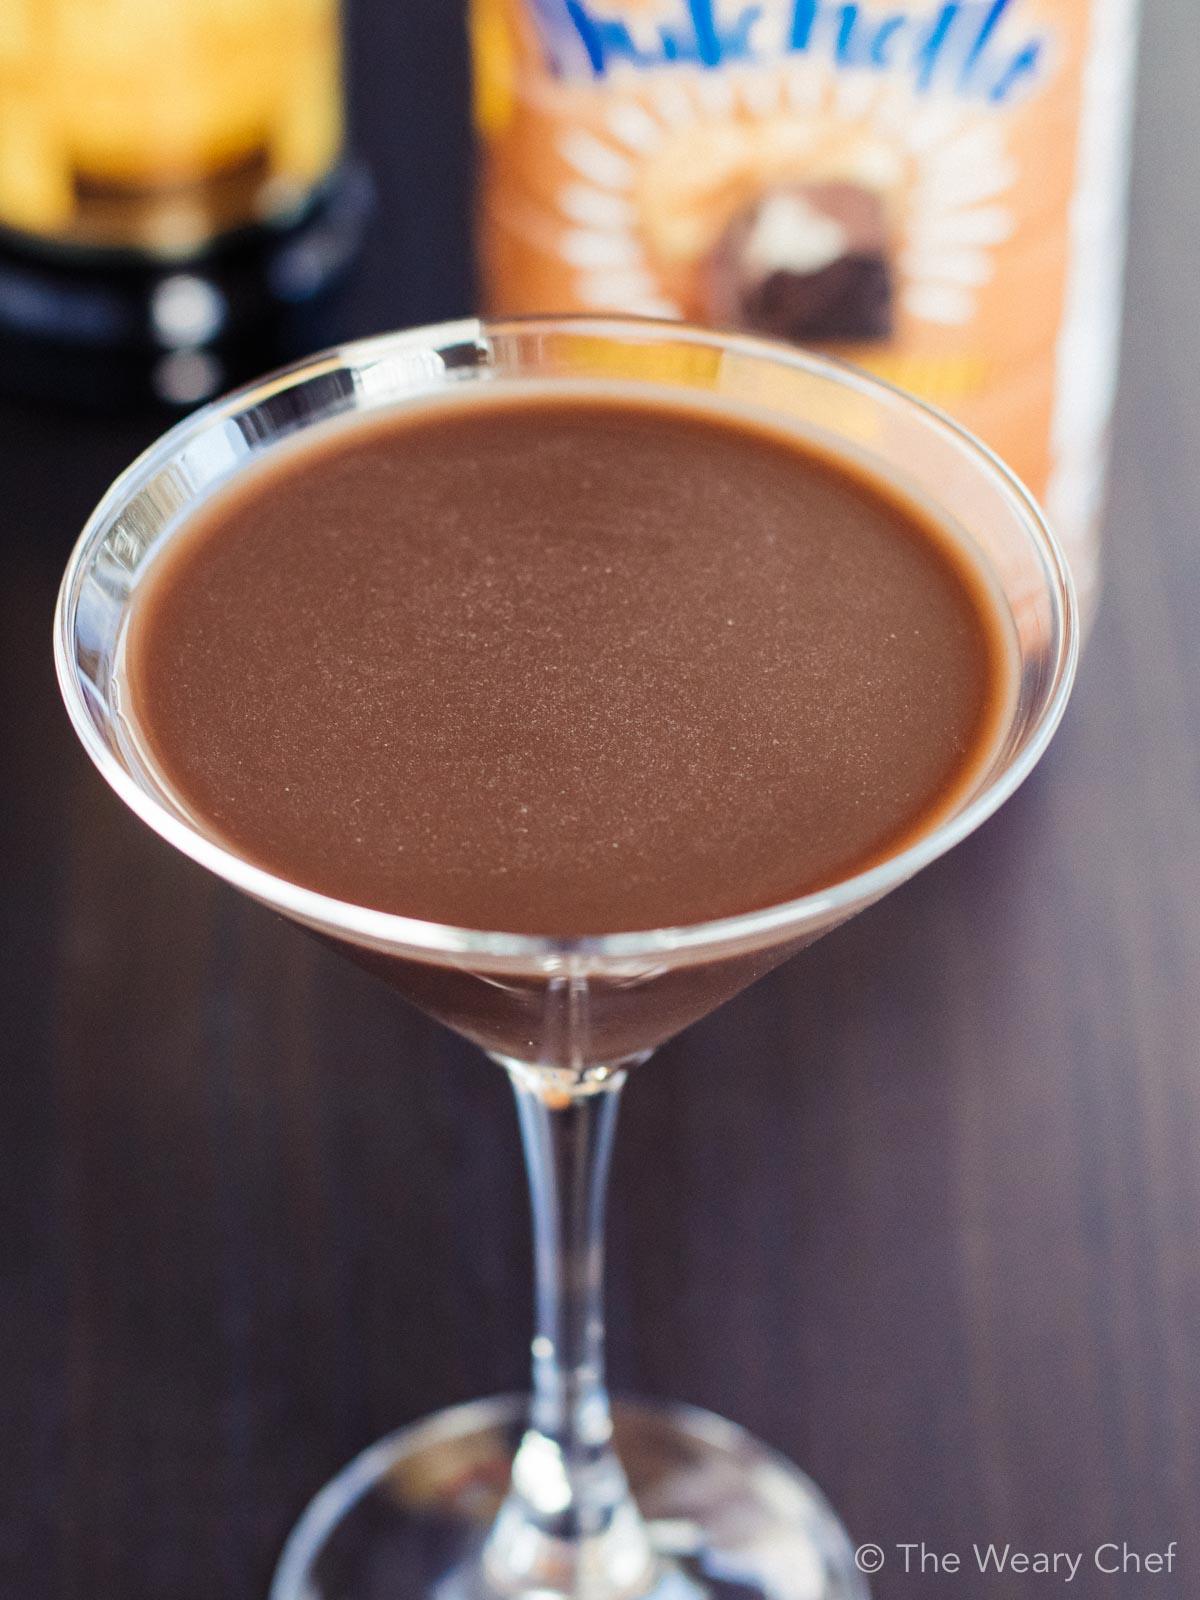 Enjoy this dairy free chocolate mudslide for a dessert cocktail.